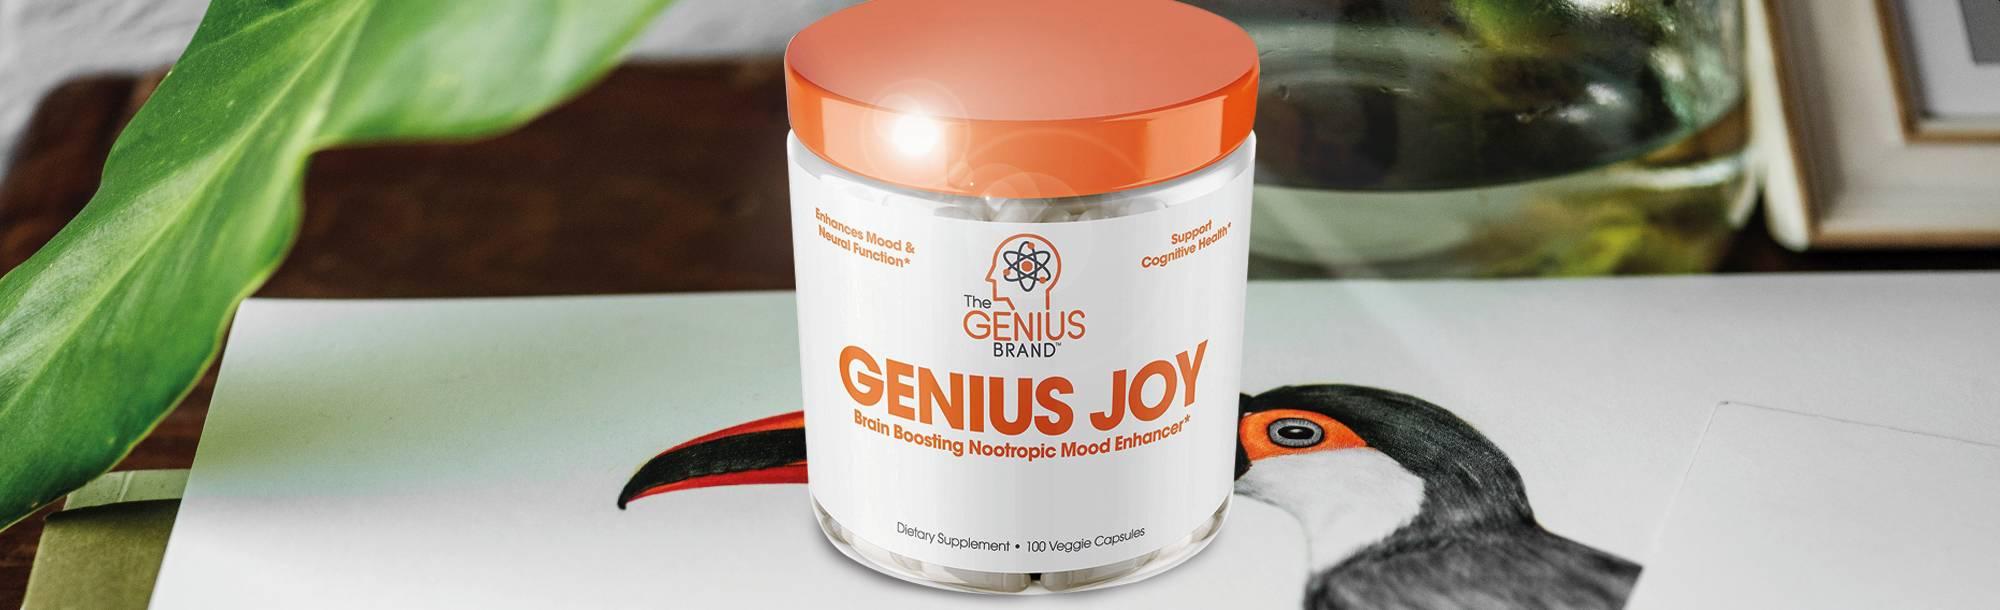 The Genius Brand Genius Joy Review